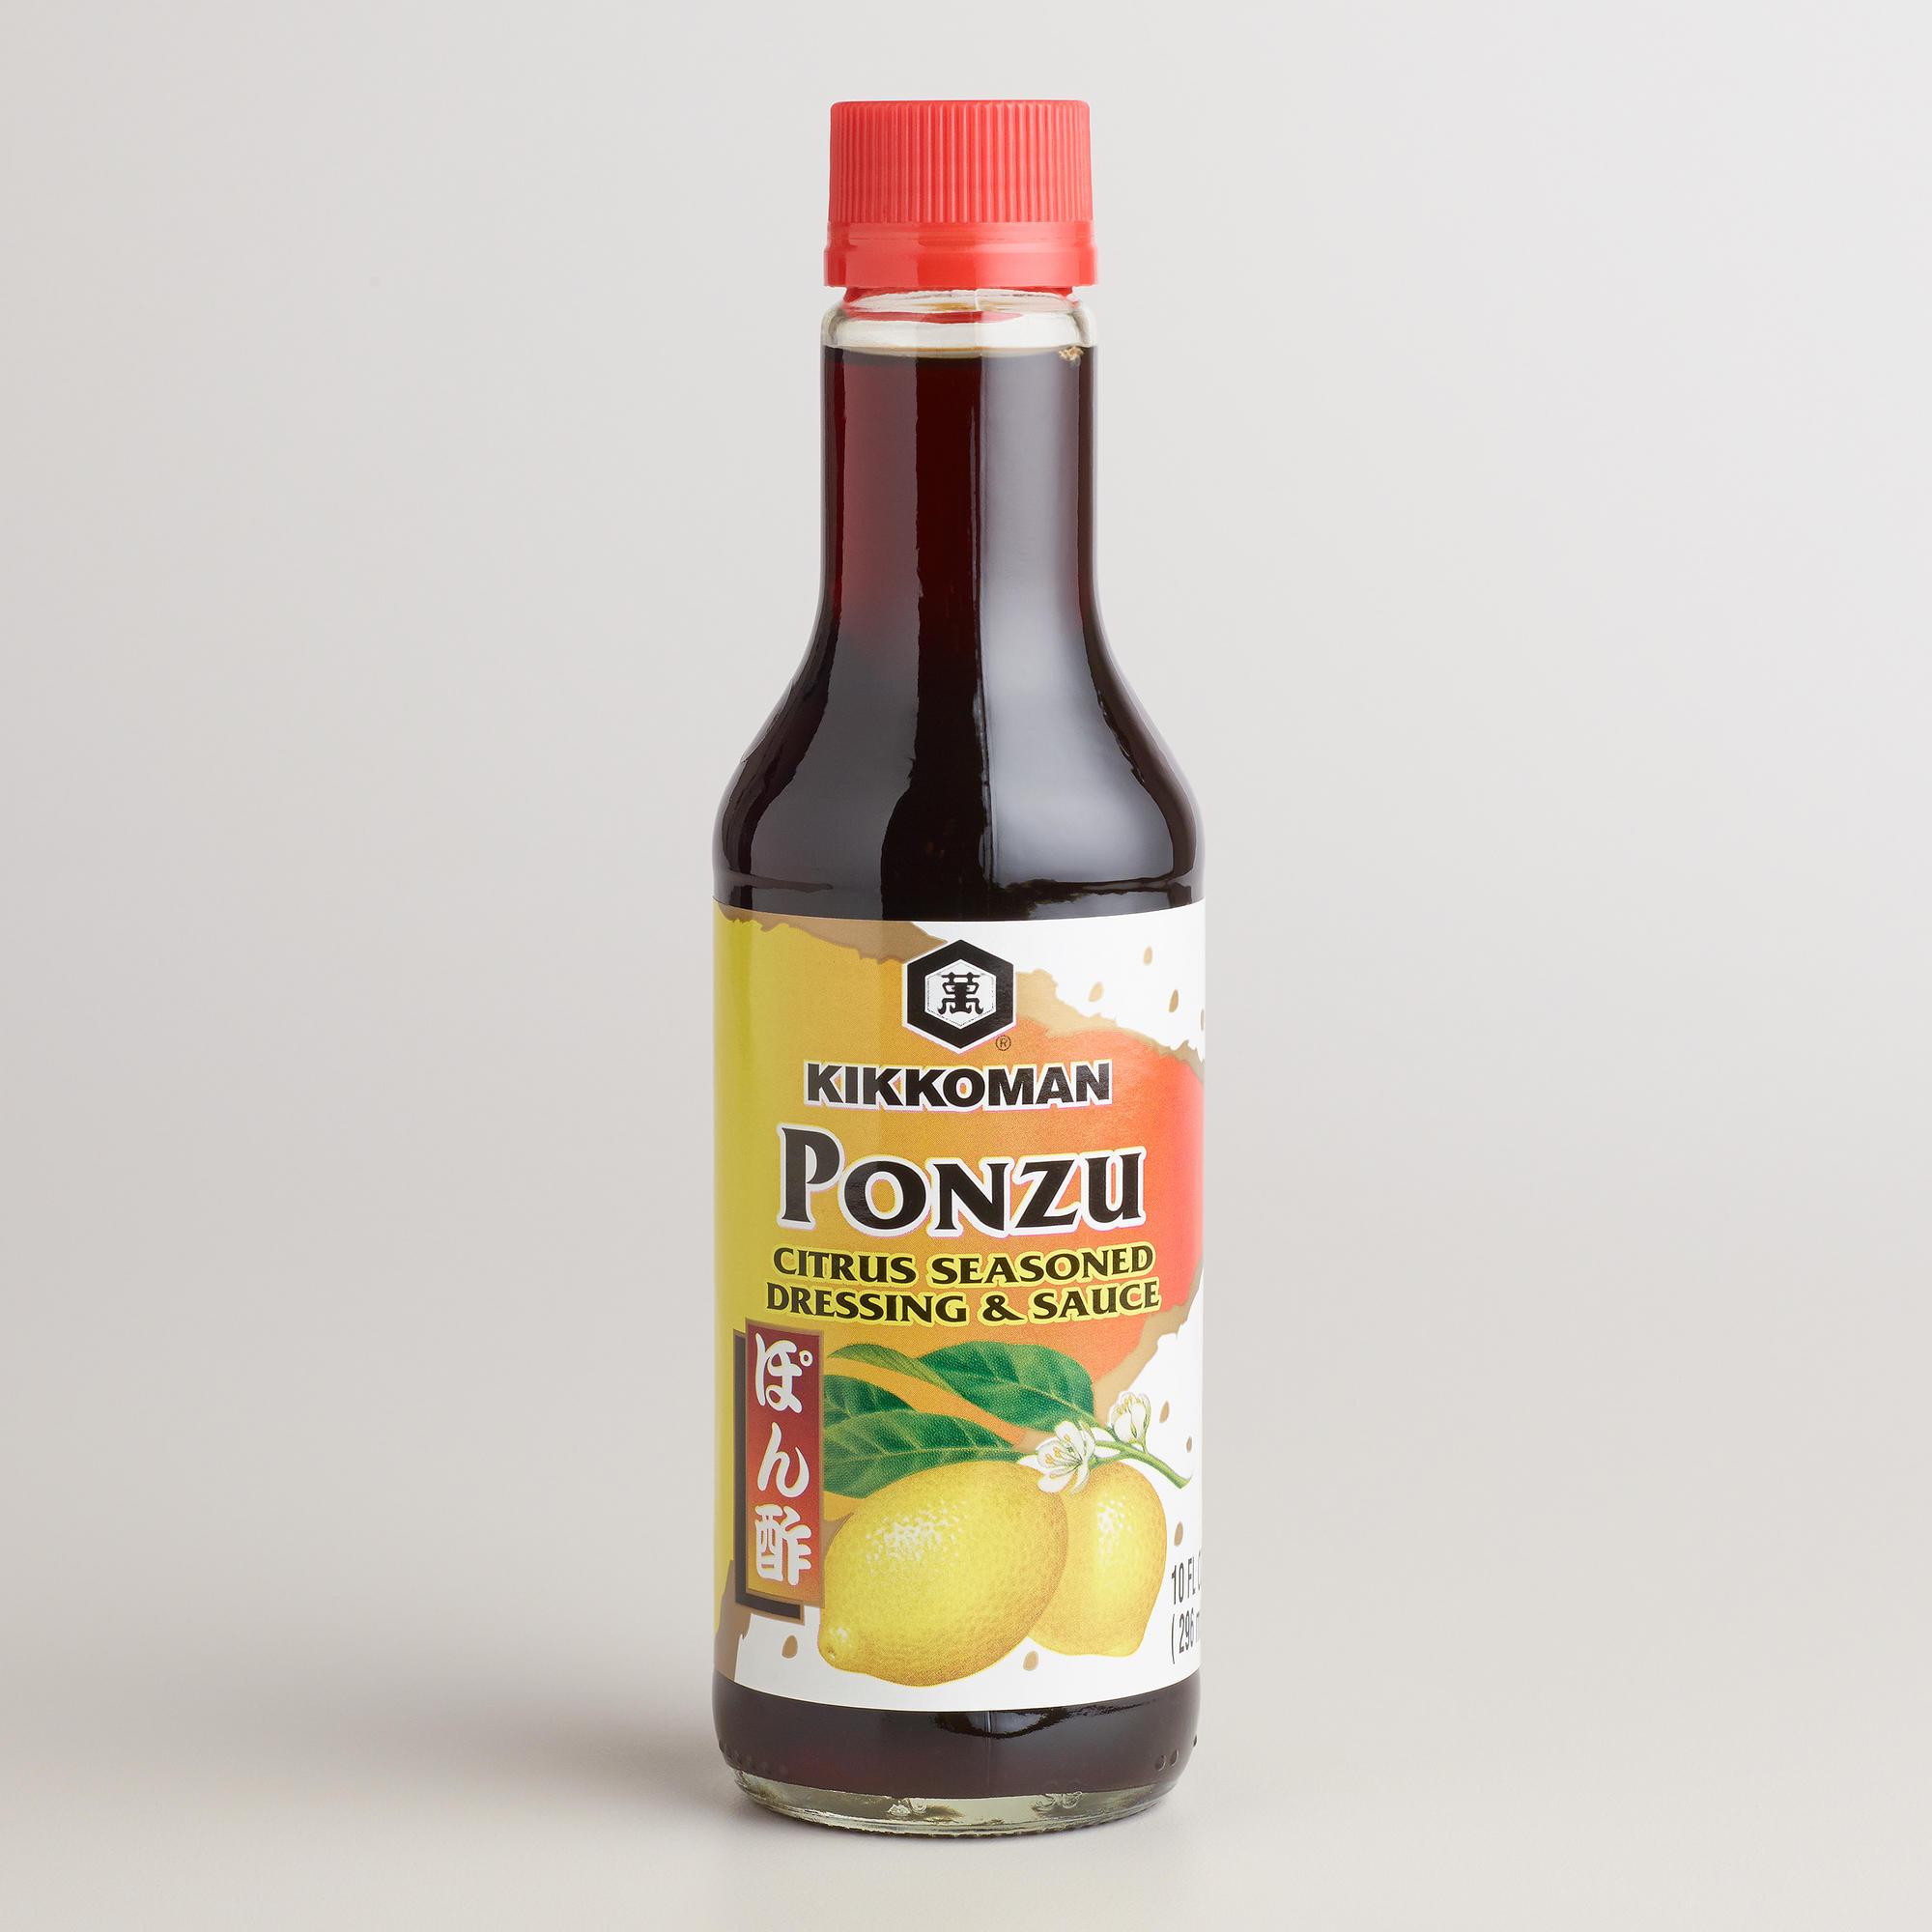 Ponzu